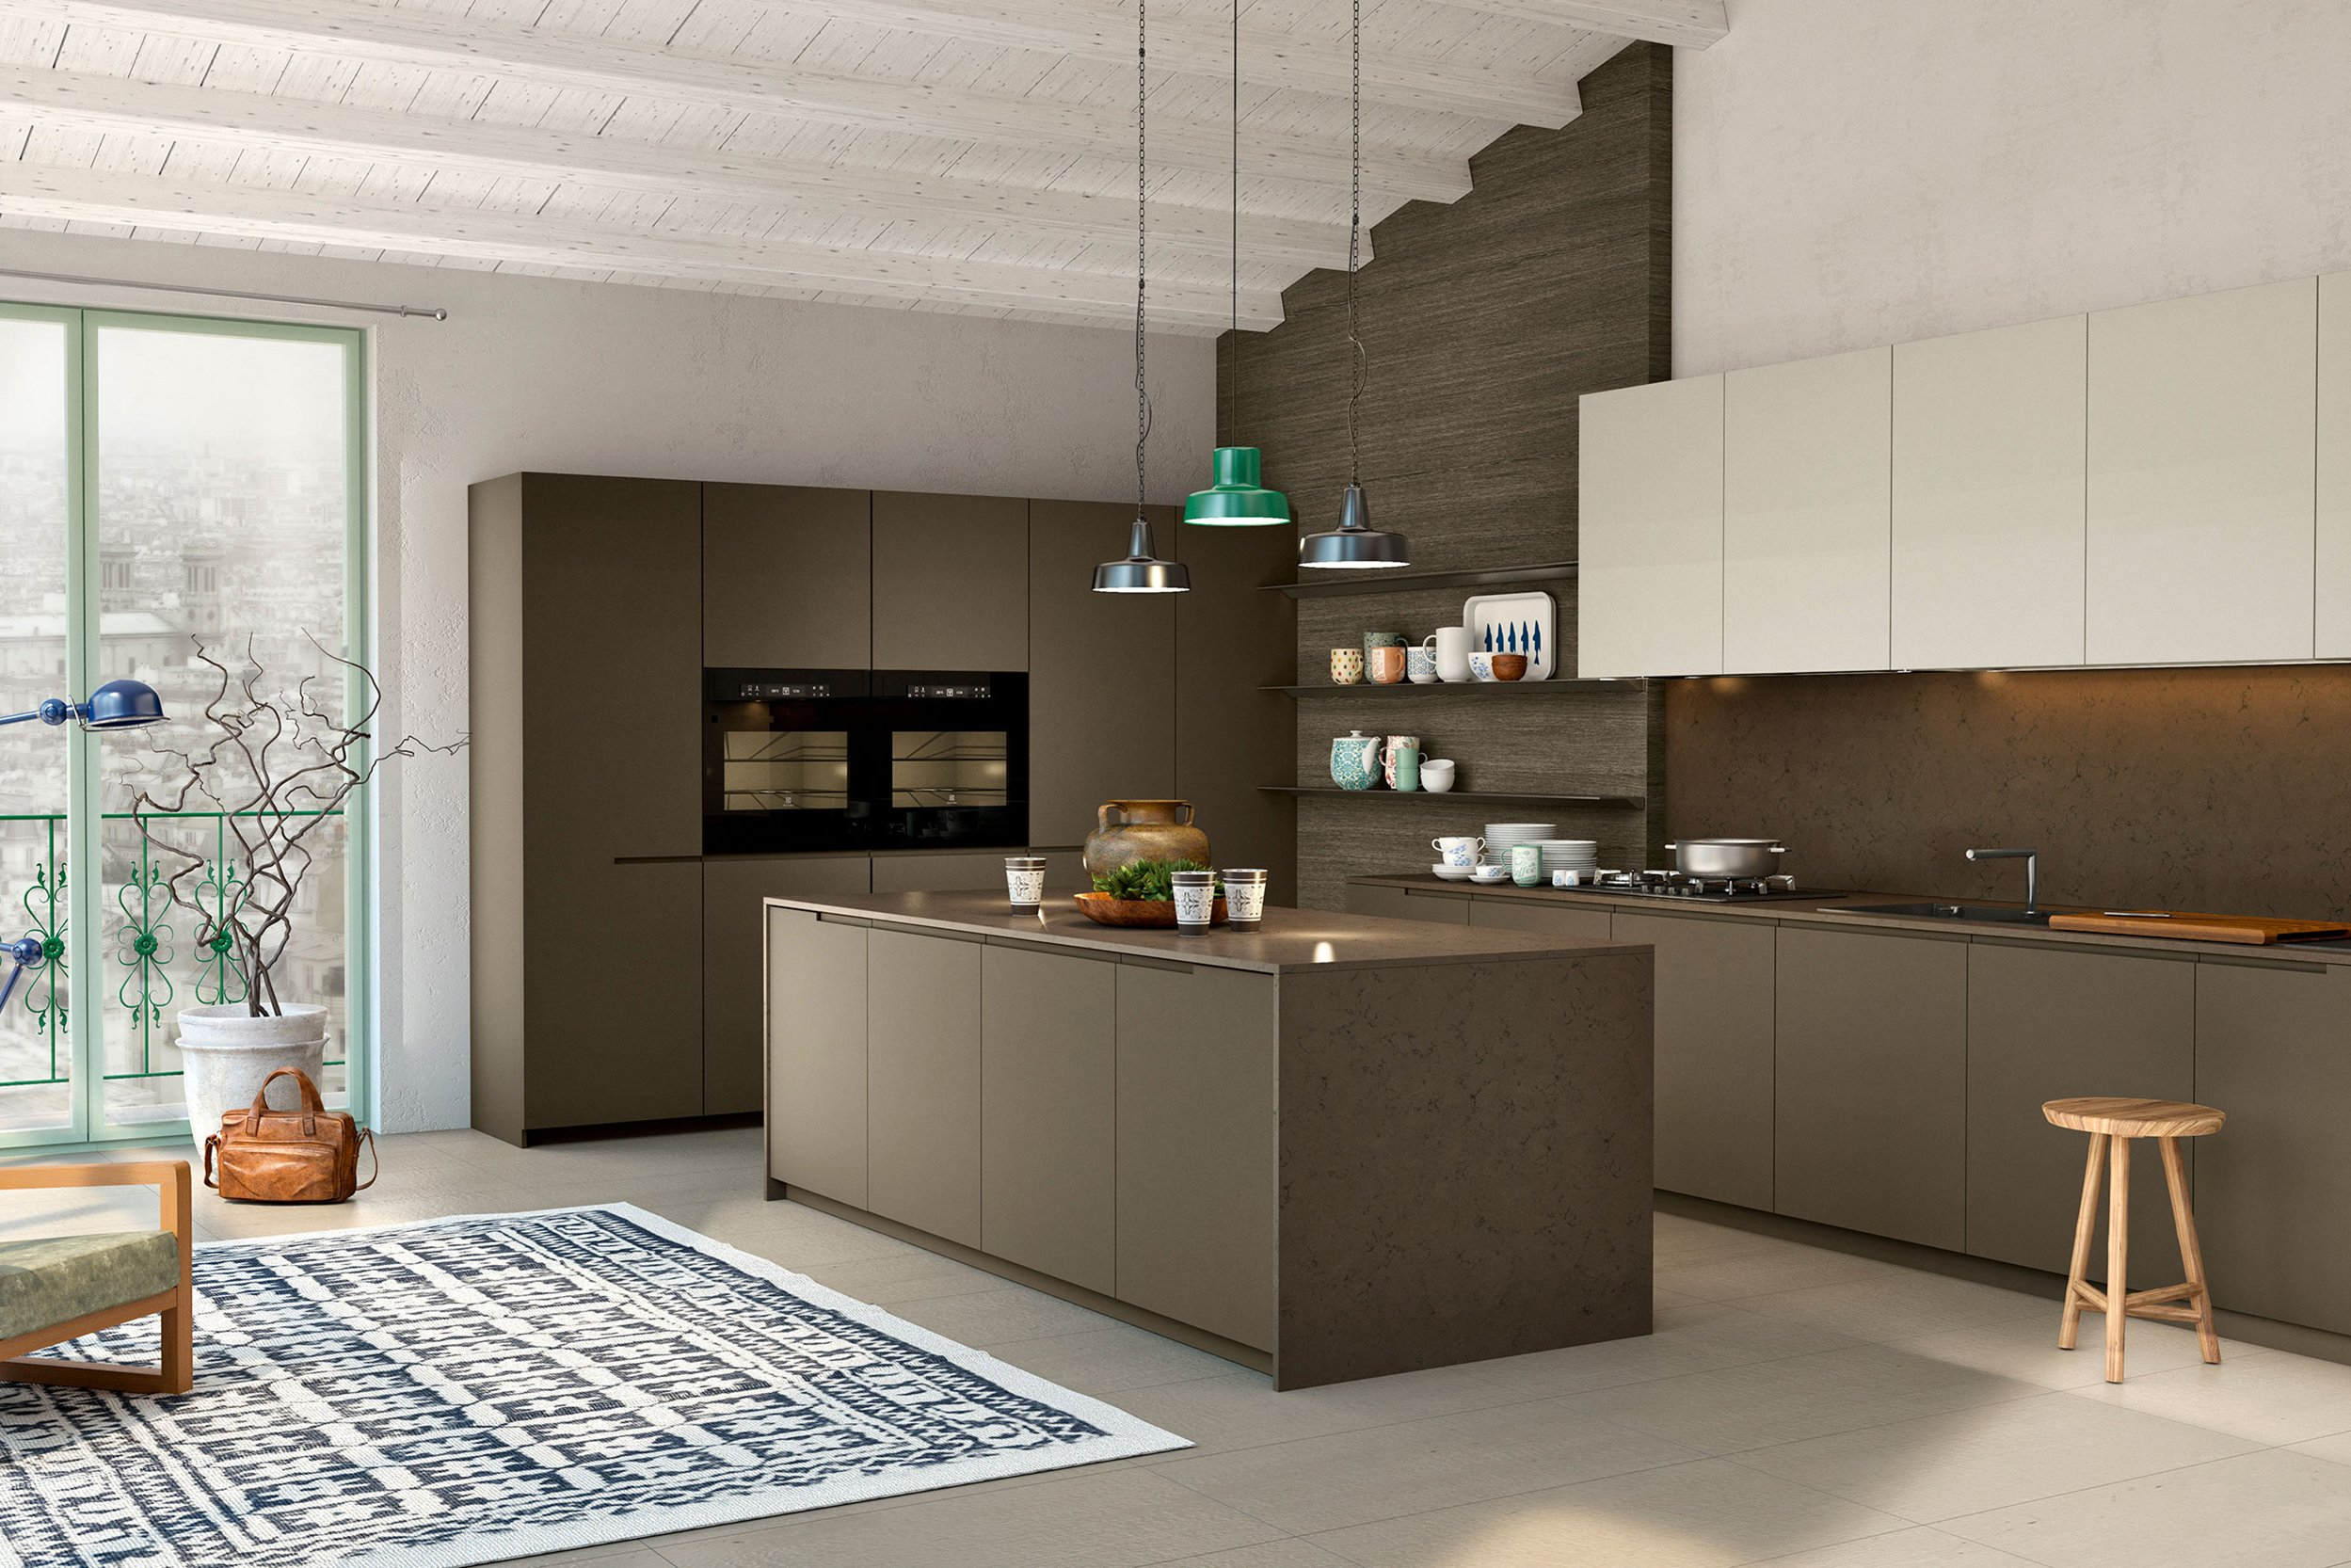 La cucina moderna tra design e gourmet